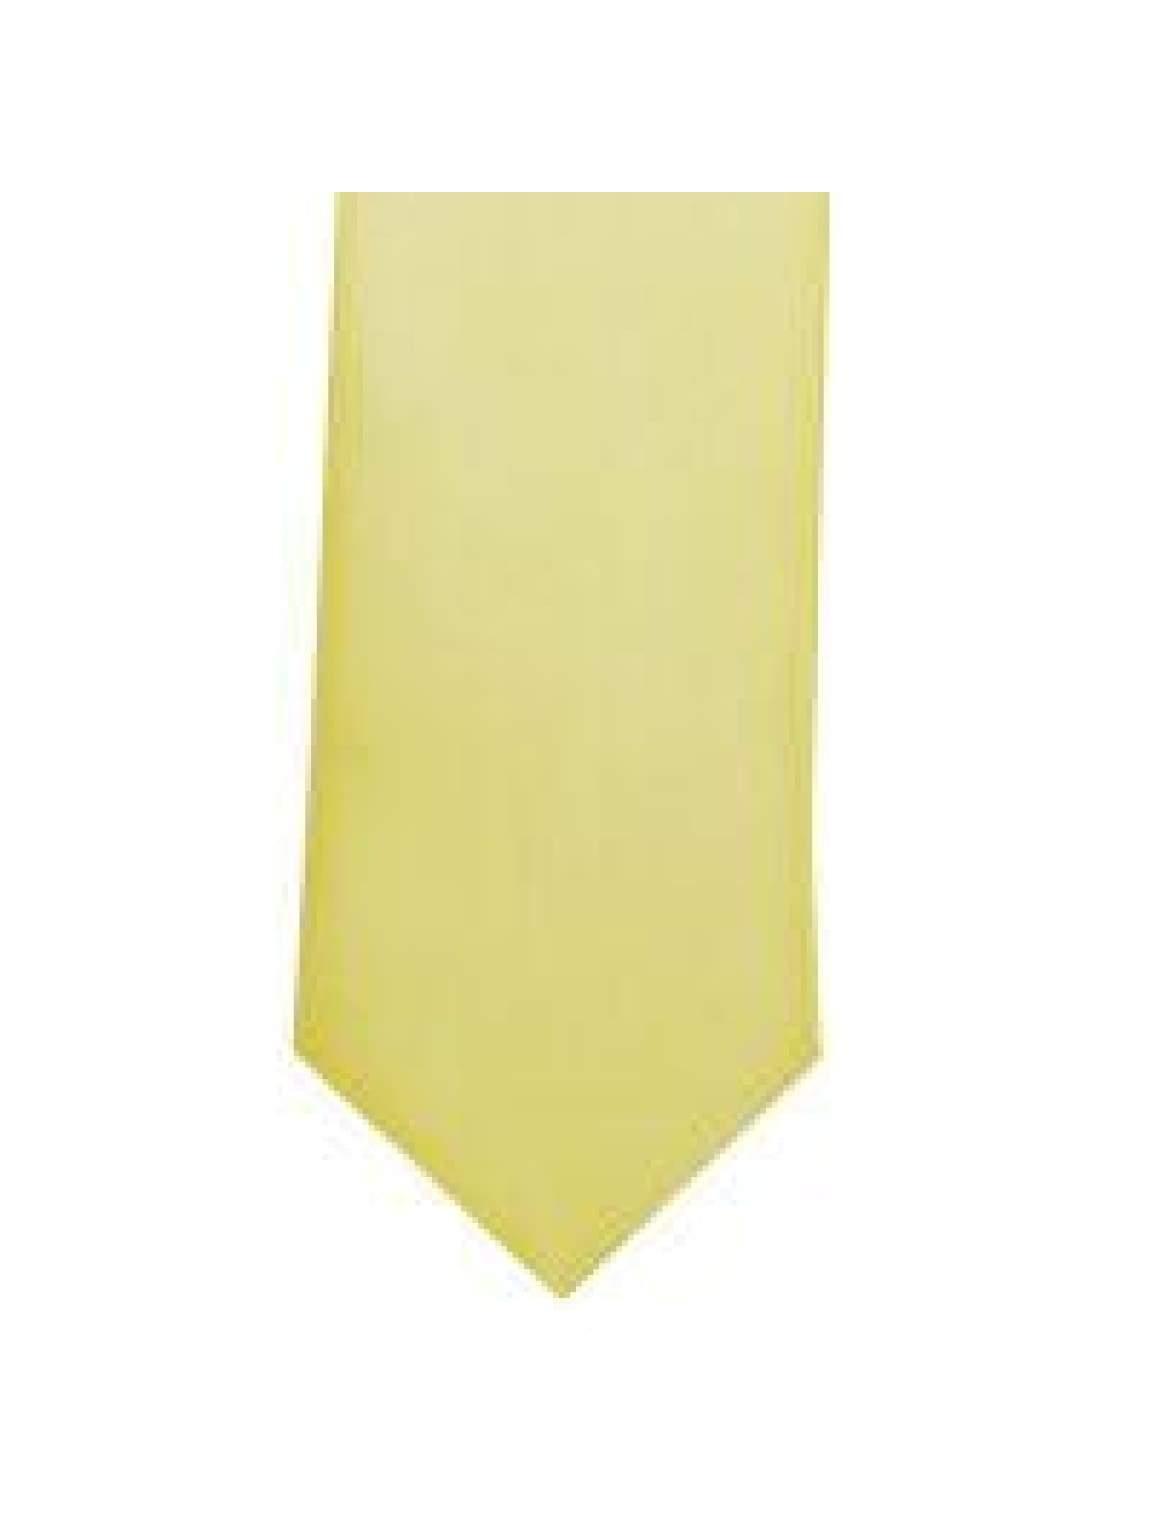 LA Smith Lemon Skinny Weft Satin Tie - Accessories